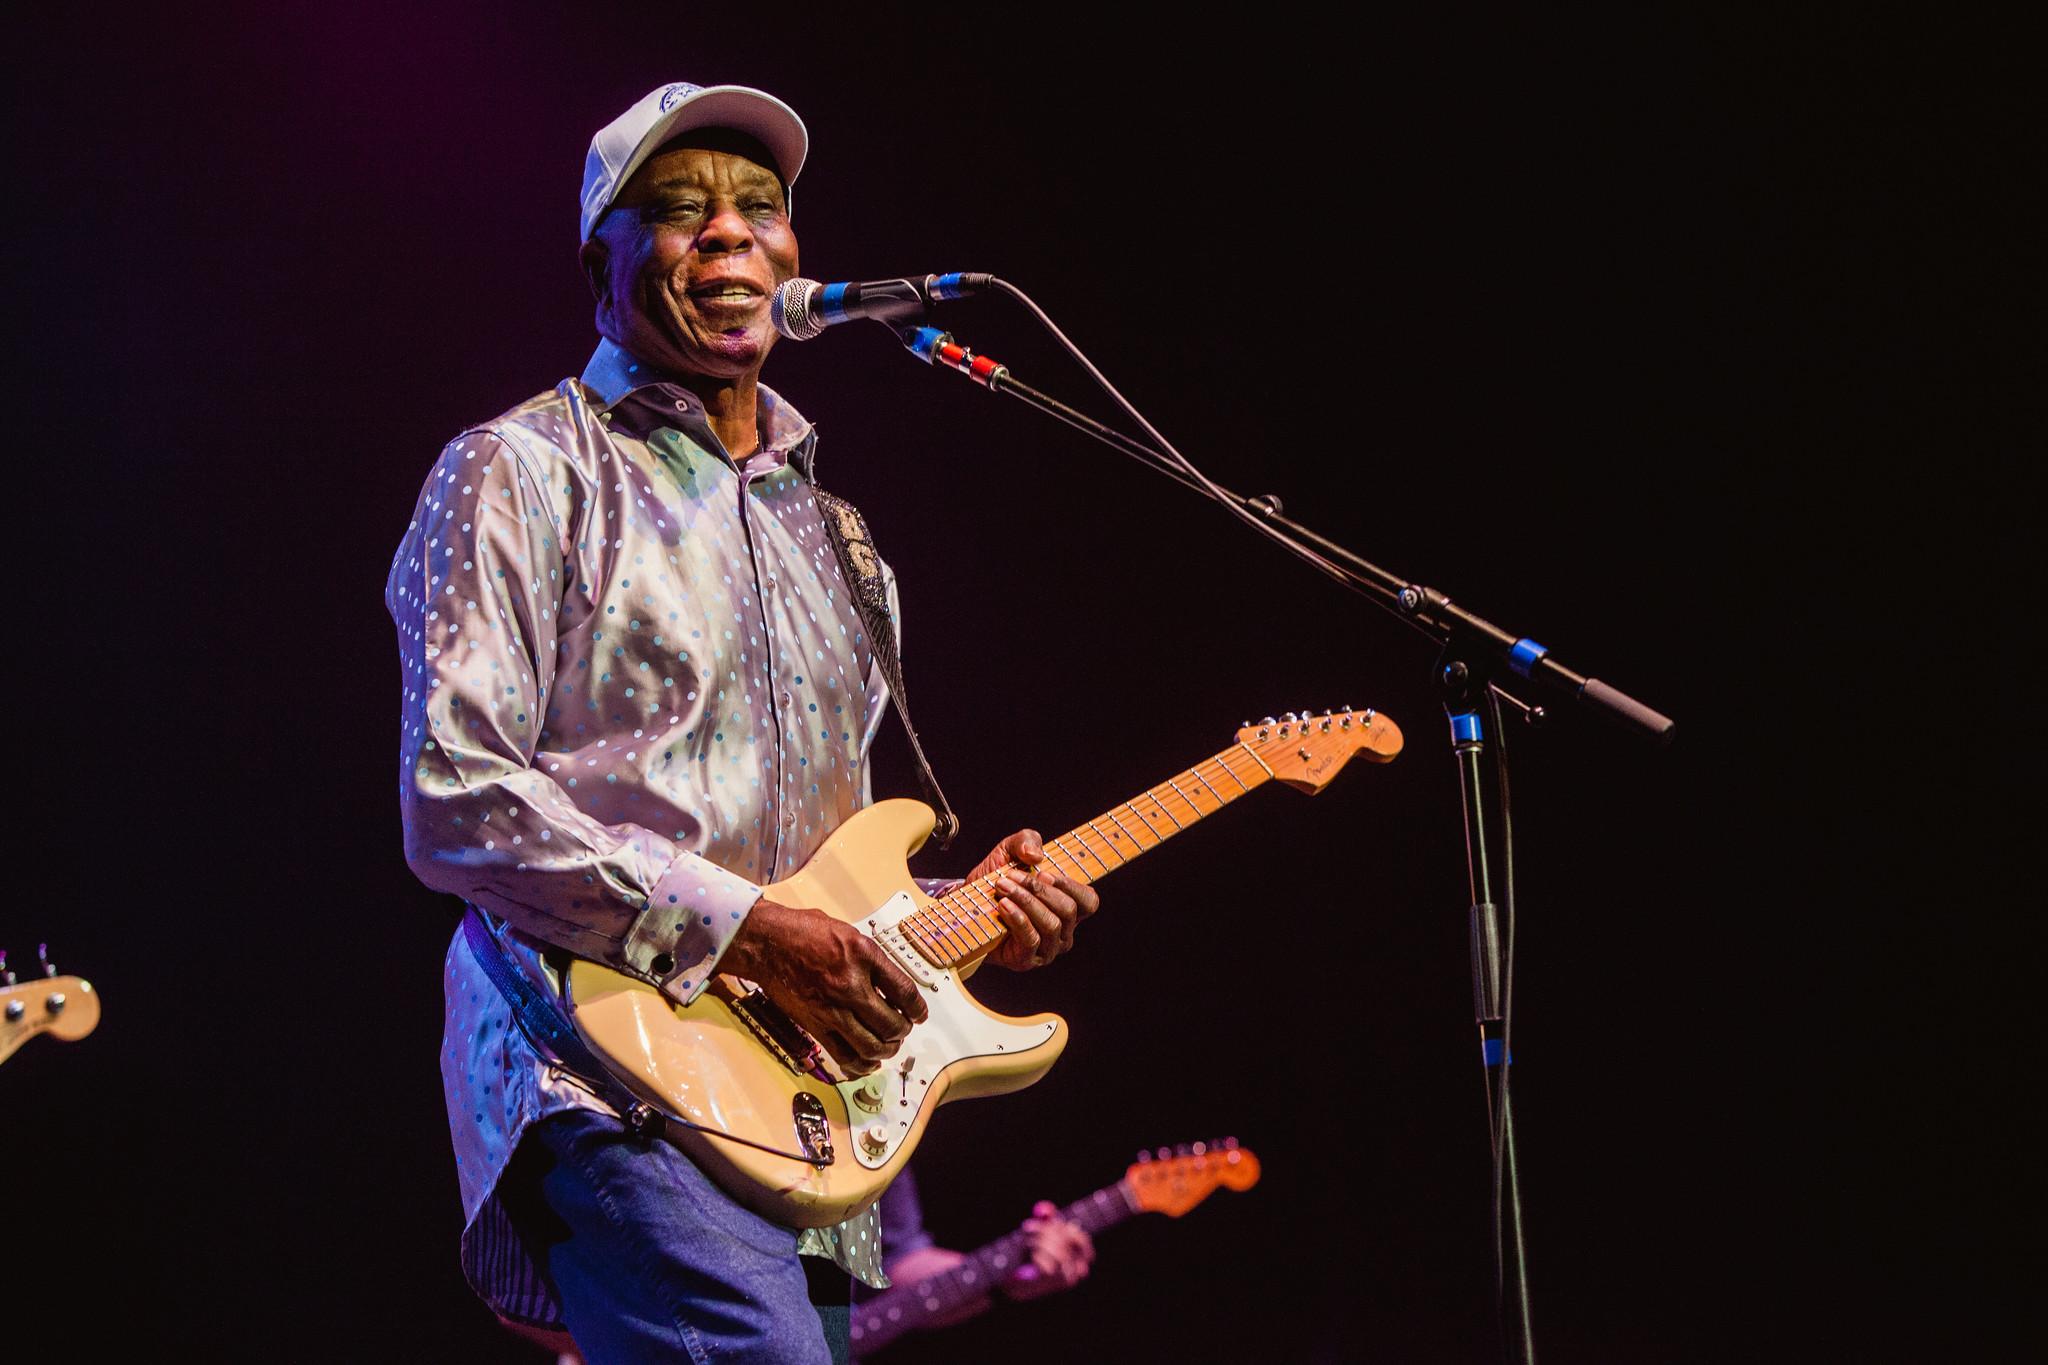 Buddy Guy w/ Experience Hendrix